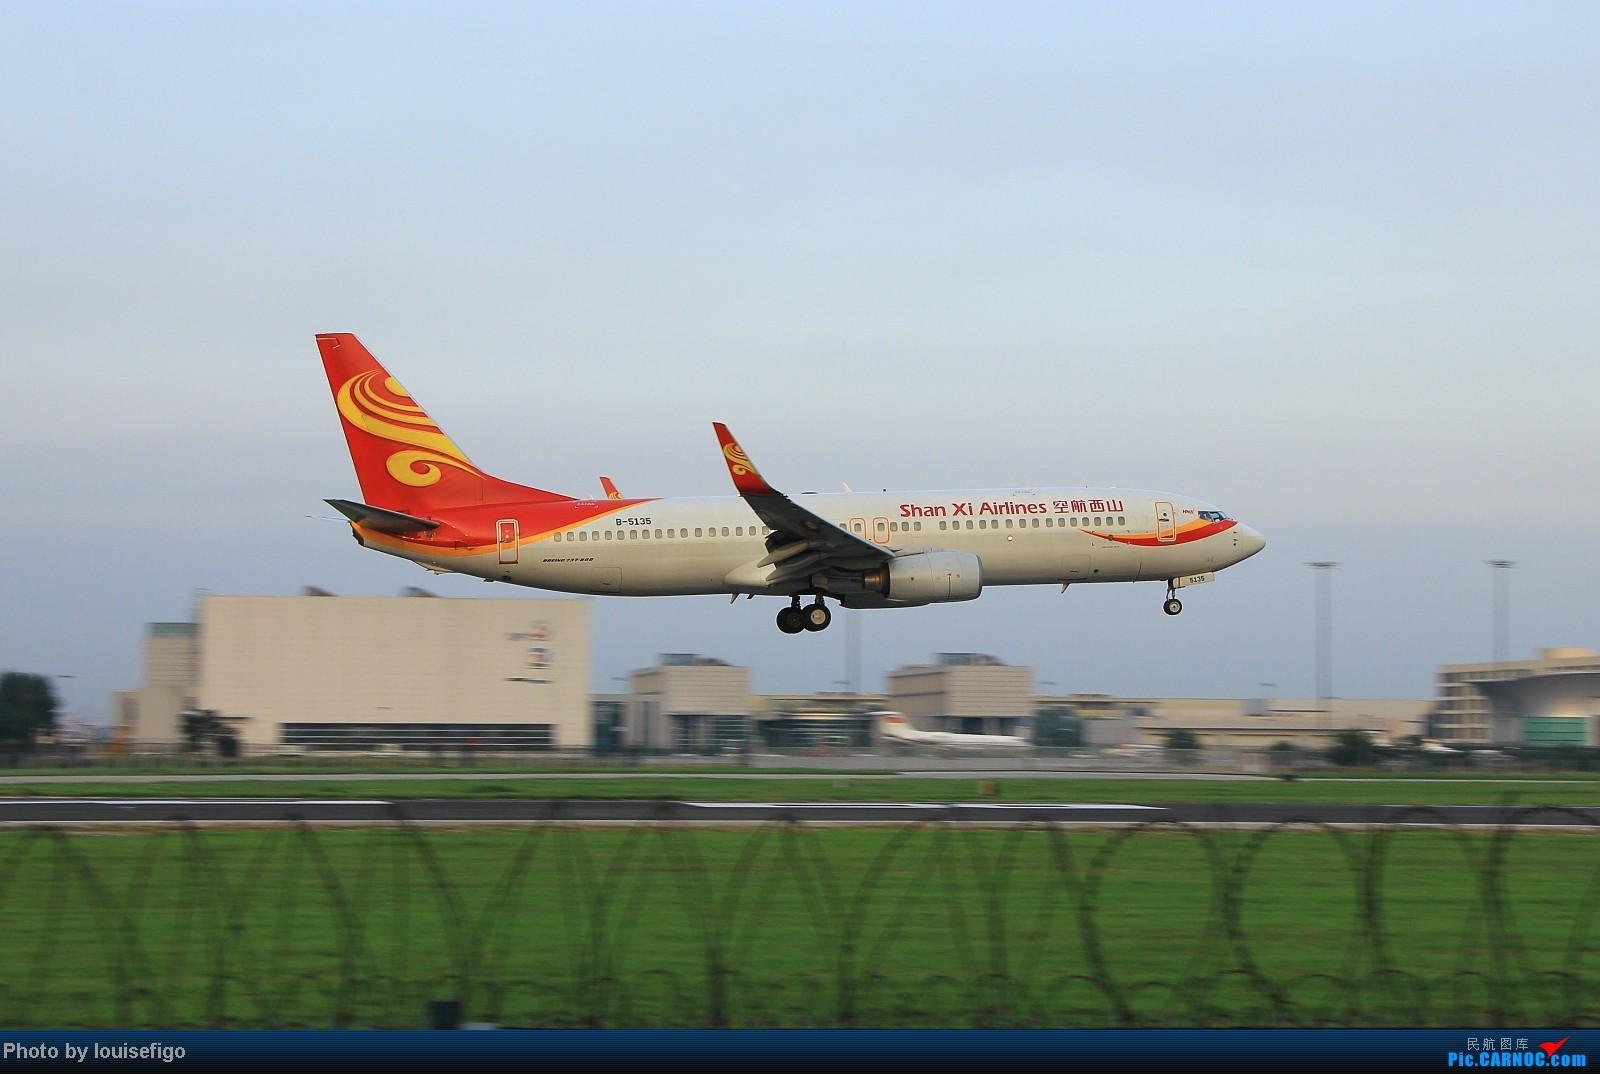 Re:[原创]闲来无事天气闷,发点冷饭自娱乐!!!PEK西跑的降落杂图~发到哪儿是哪儿啊!随心情! BOEING 737-800 B-5135 北京首都国际机场